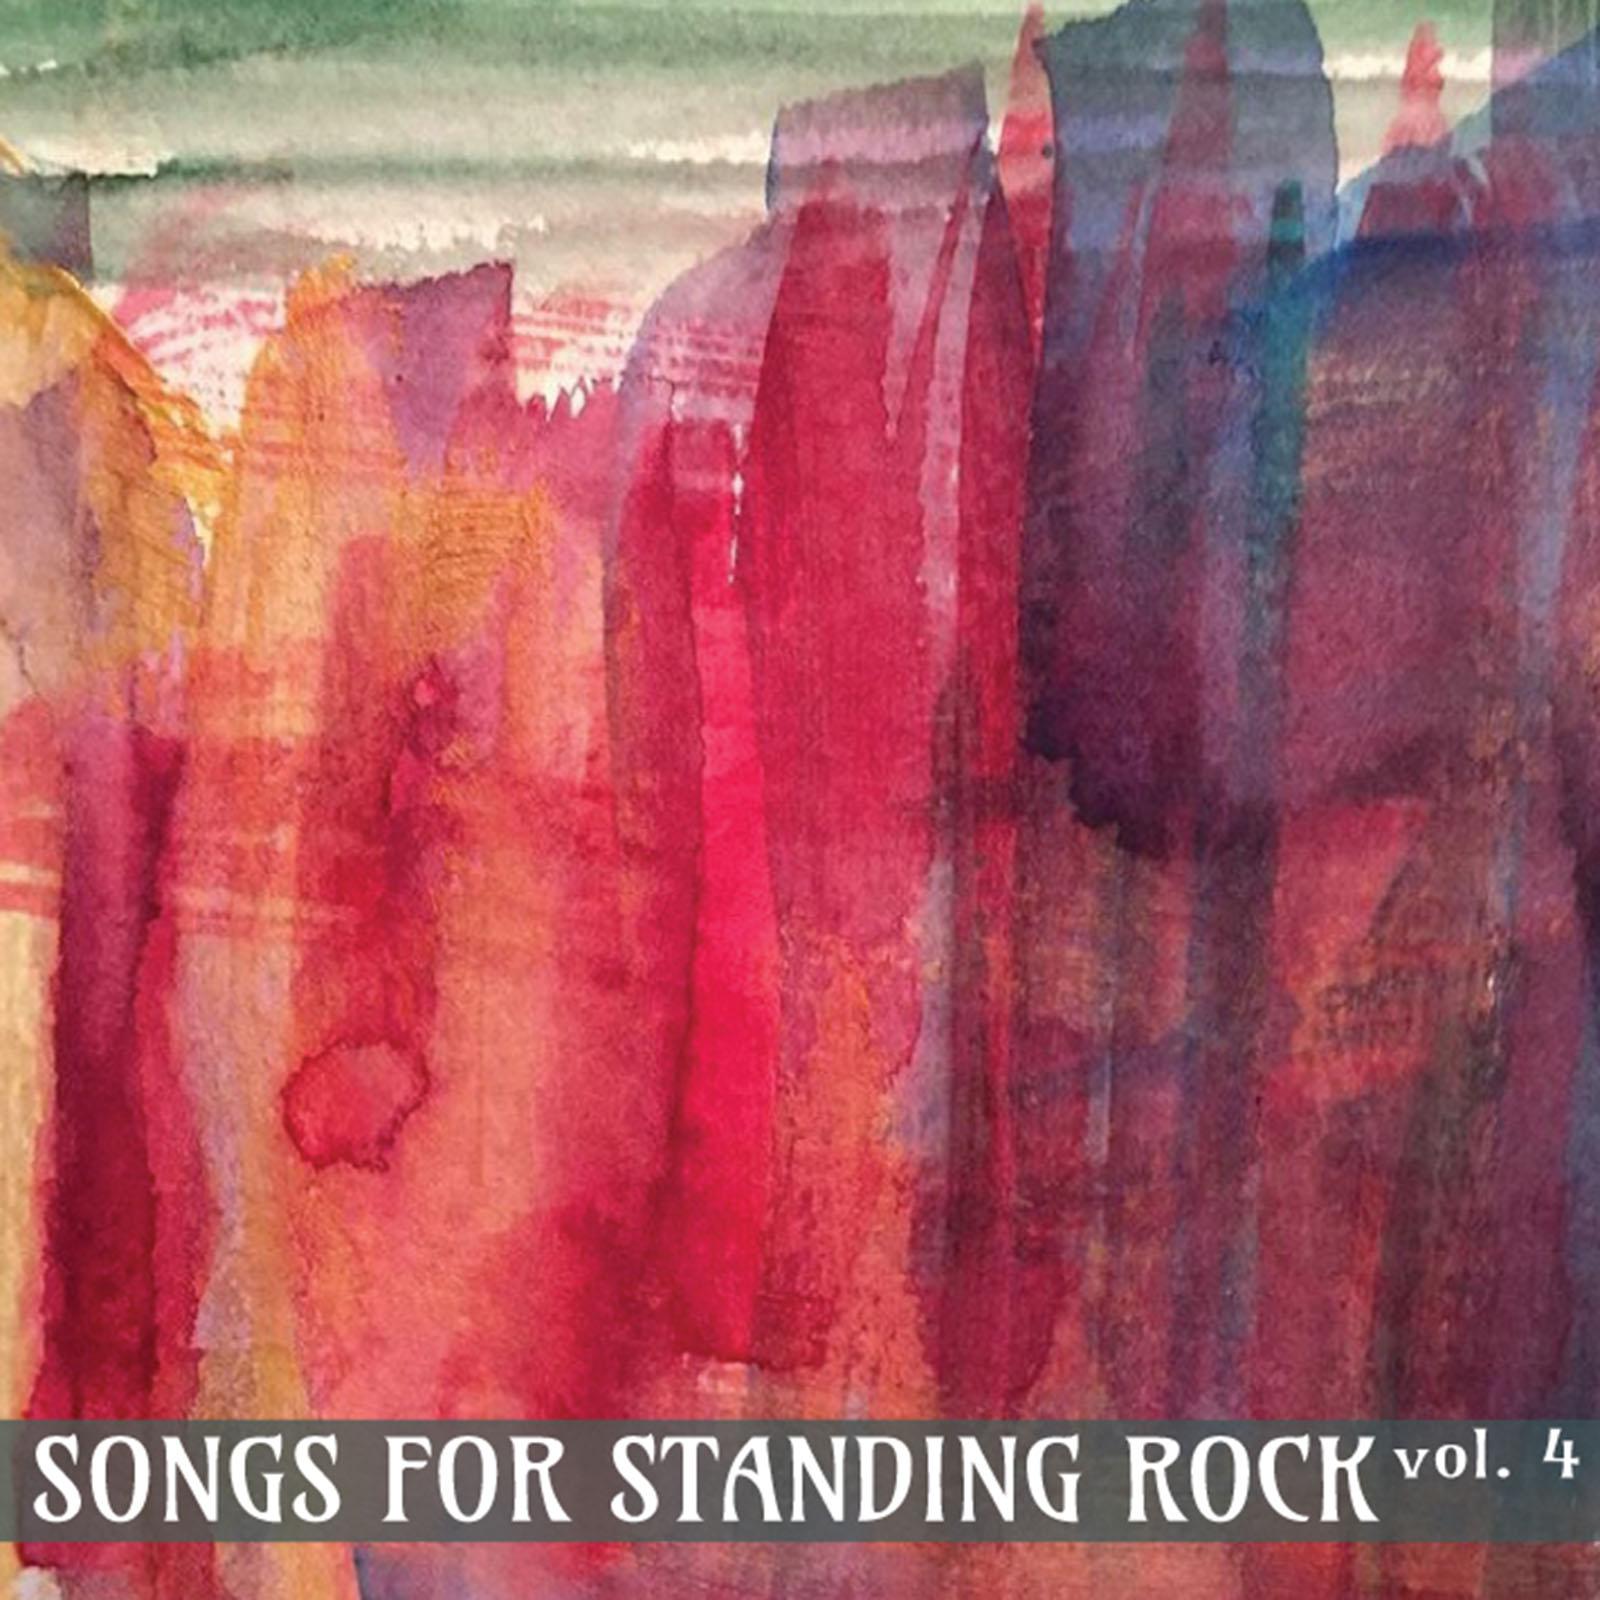 Songs for Standing Rock Vol. 4_cover-01.jpg